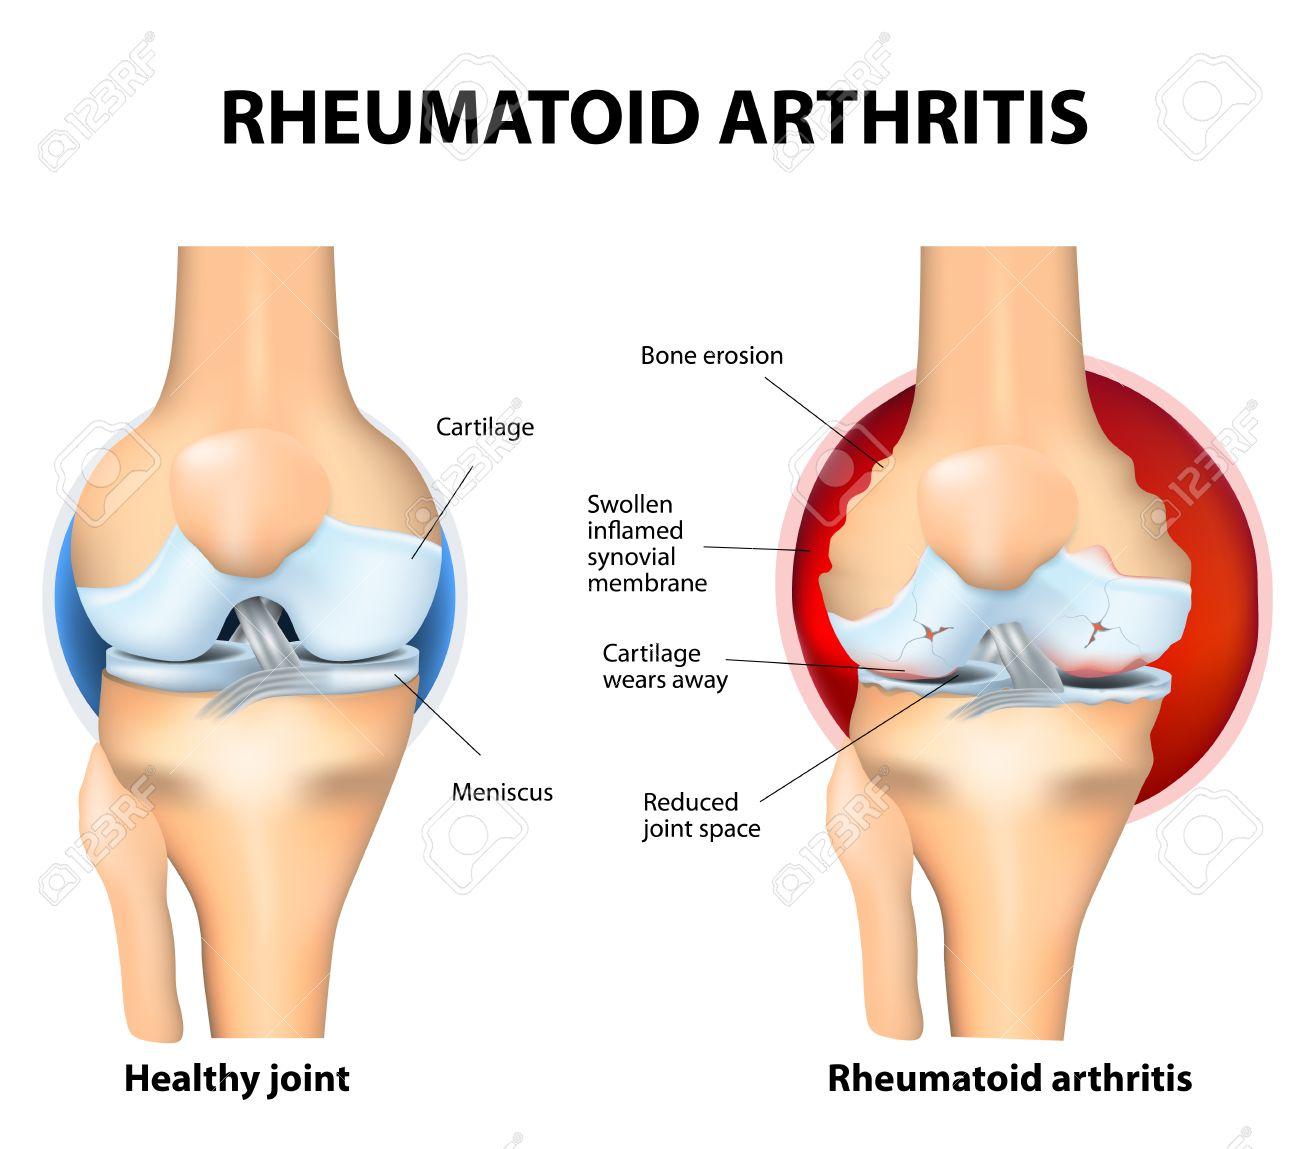 que es una reuma linear unit solfa syllable rodilla